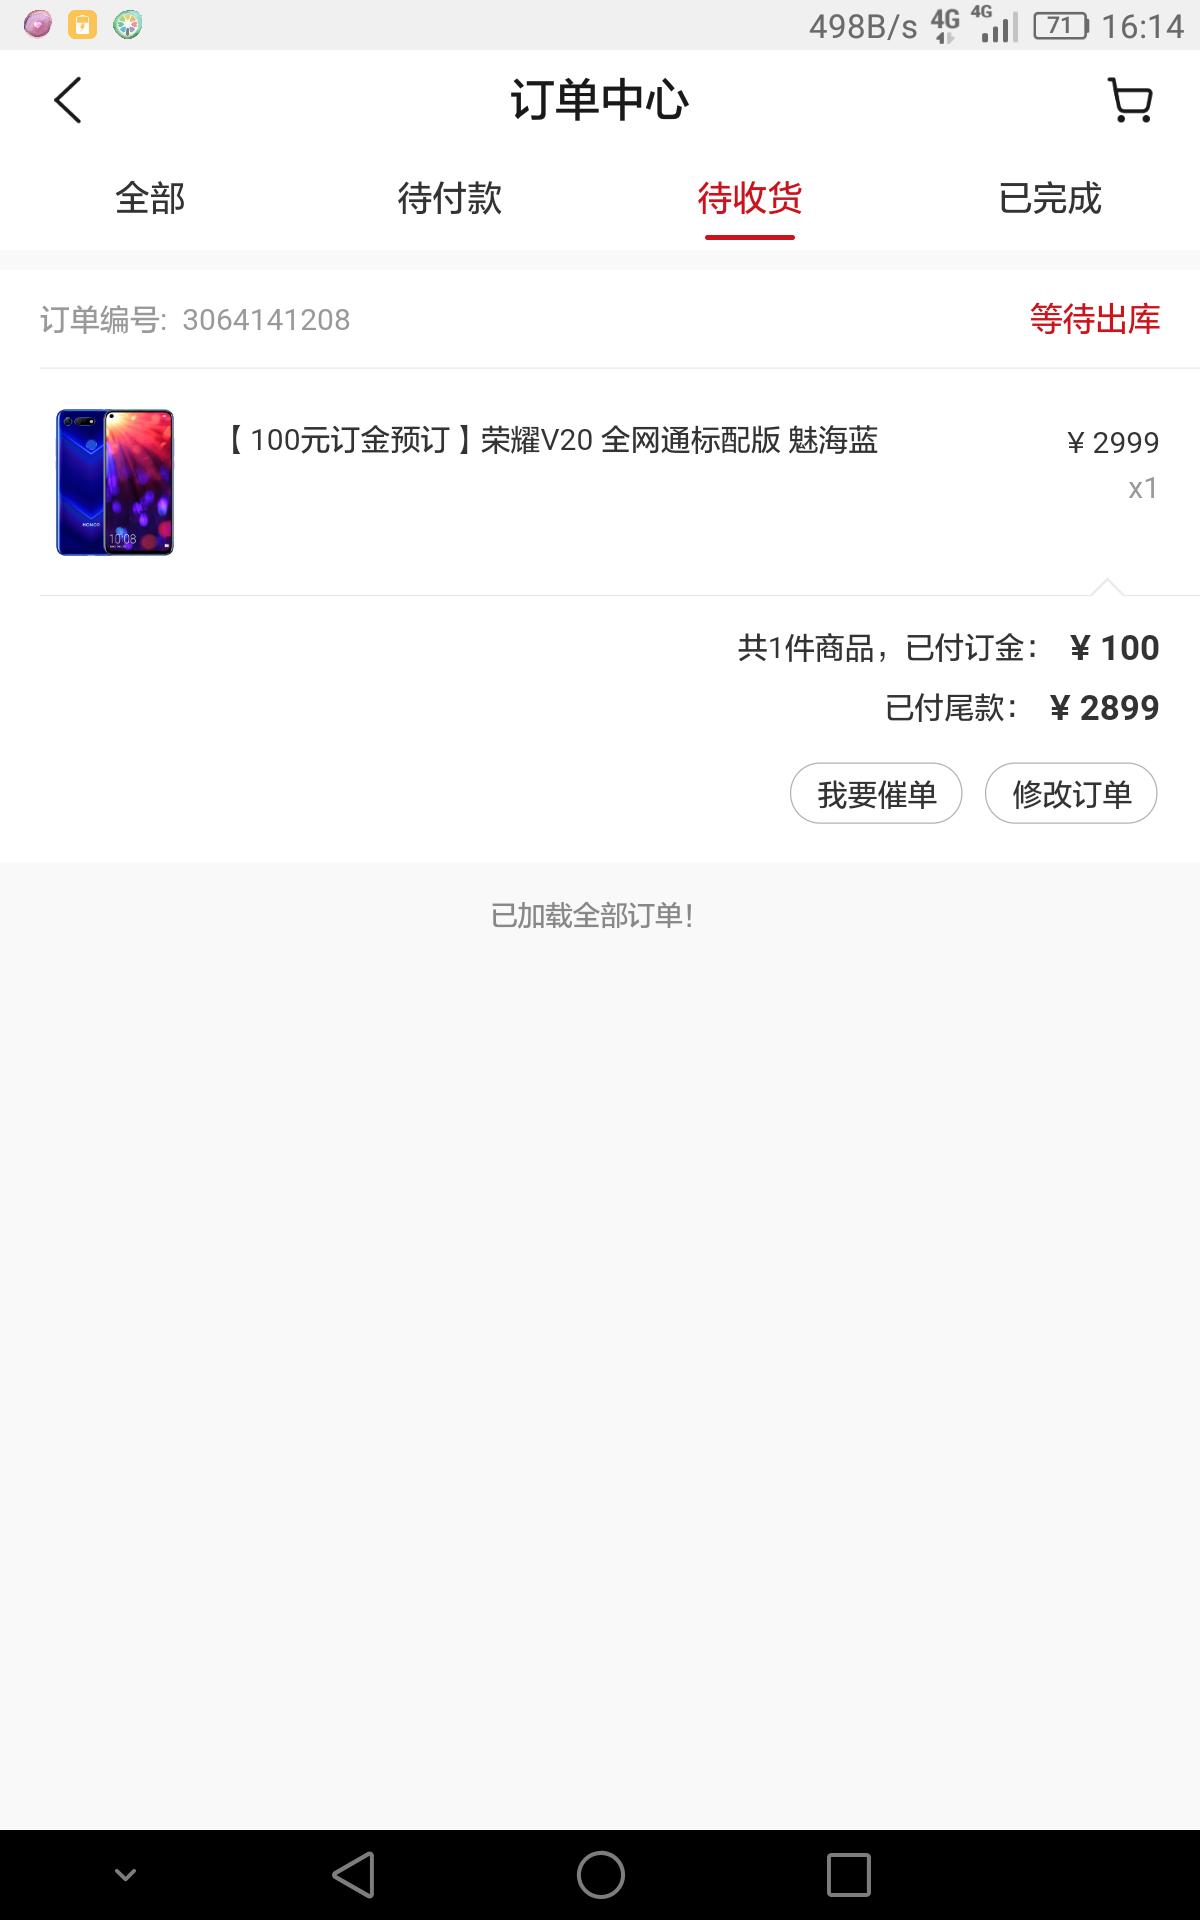 Screenshot_2018-12-29-16-14-09.png